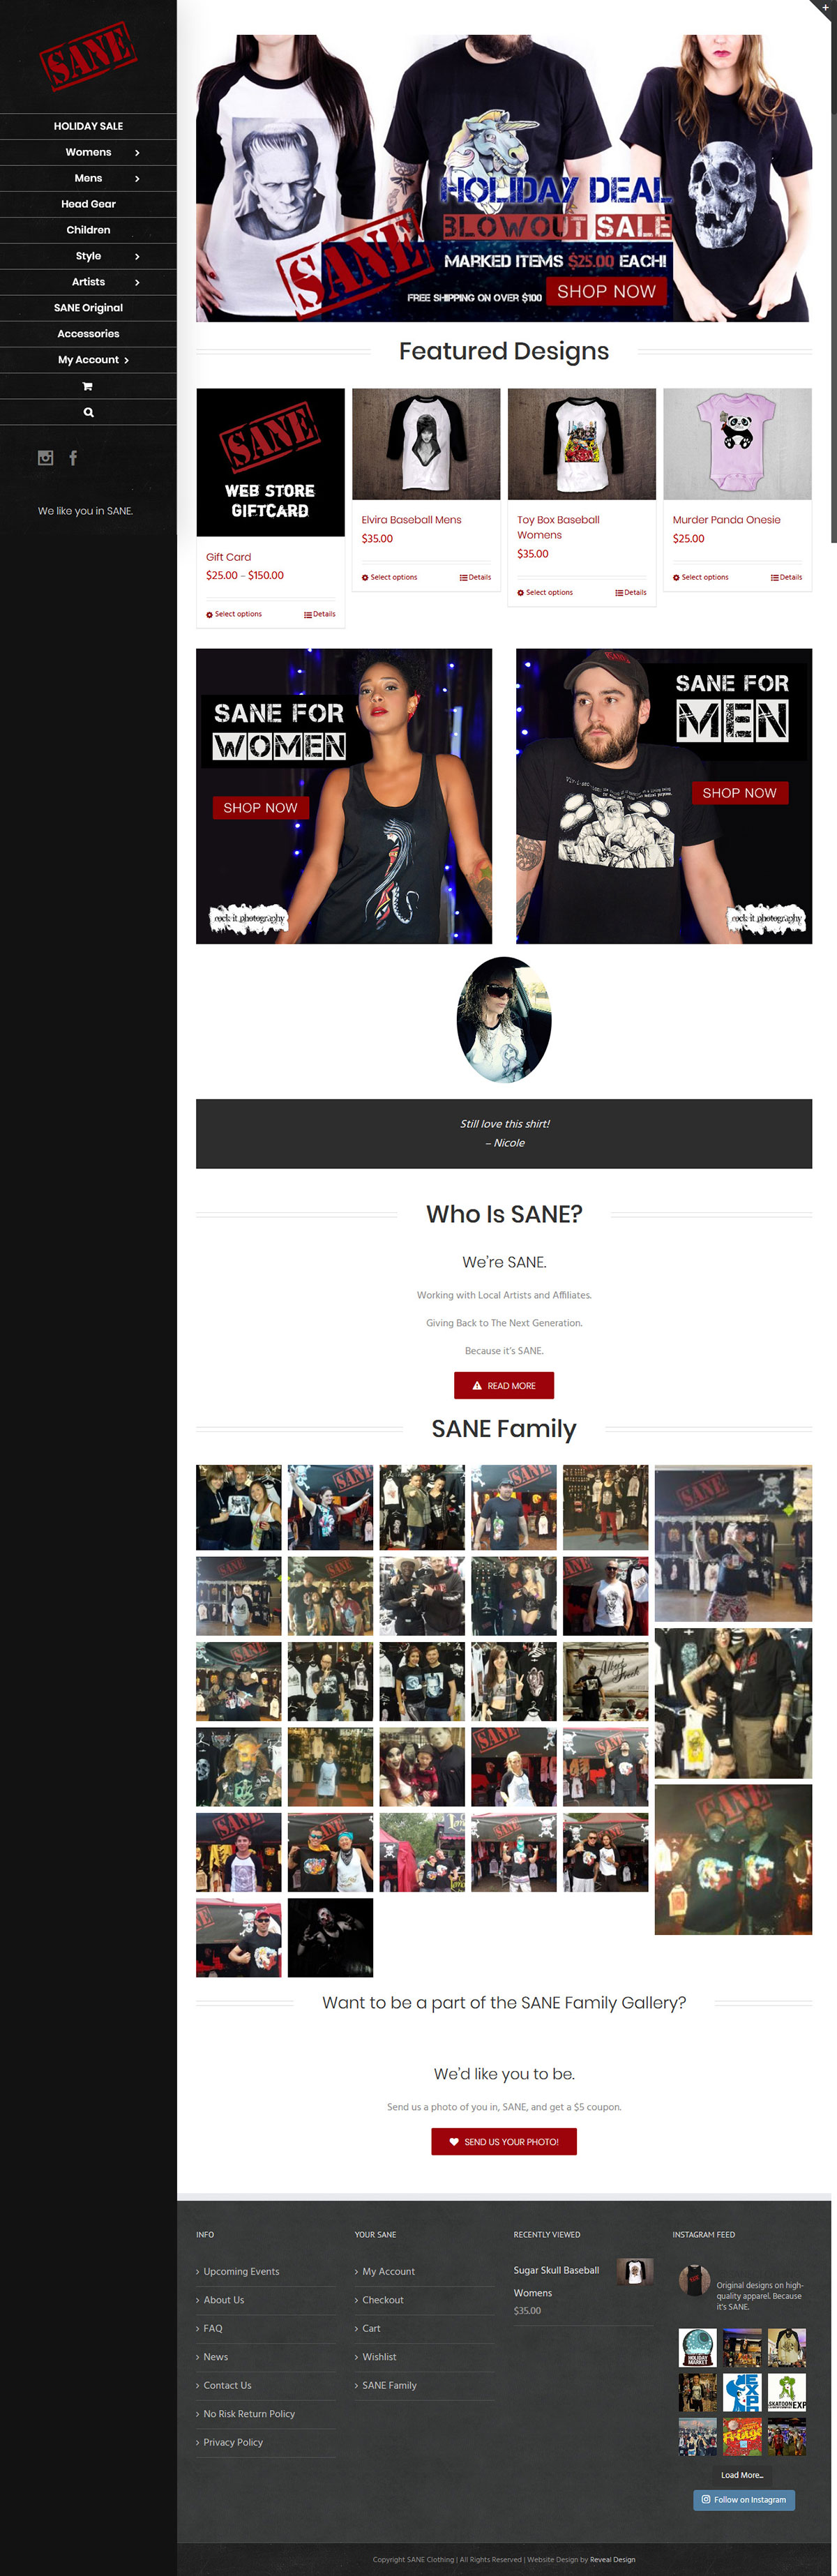 SANE Clothing Website Home